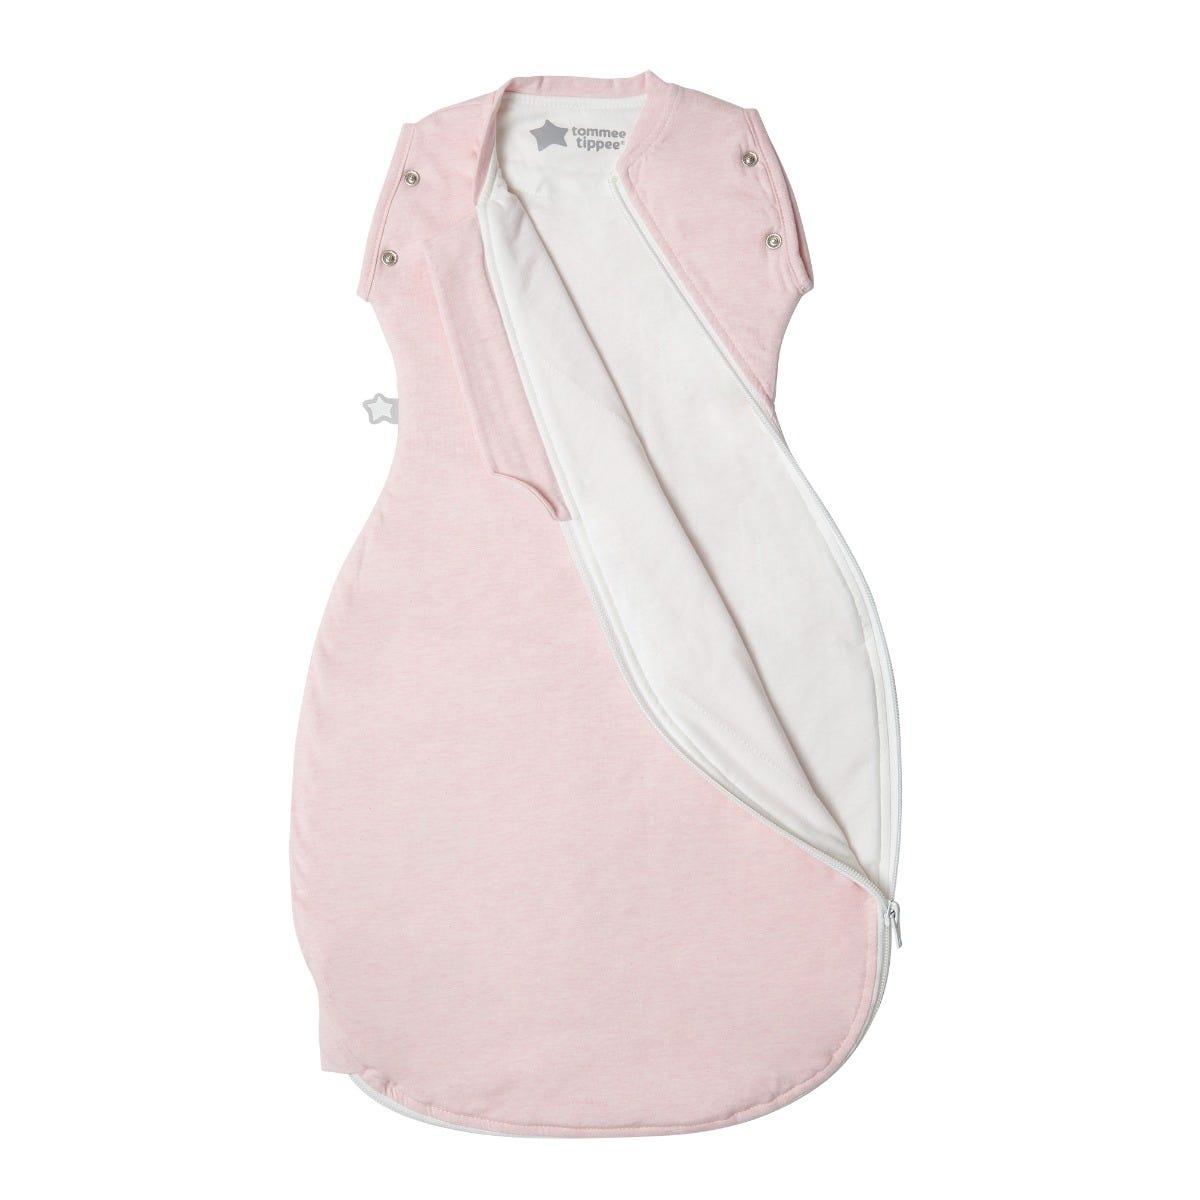 The Original Grobag Pink Marl Snuggle zip open